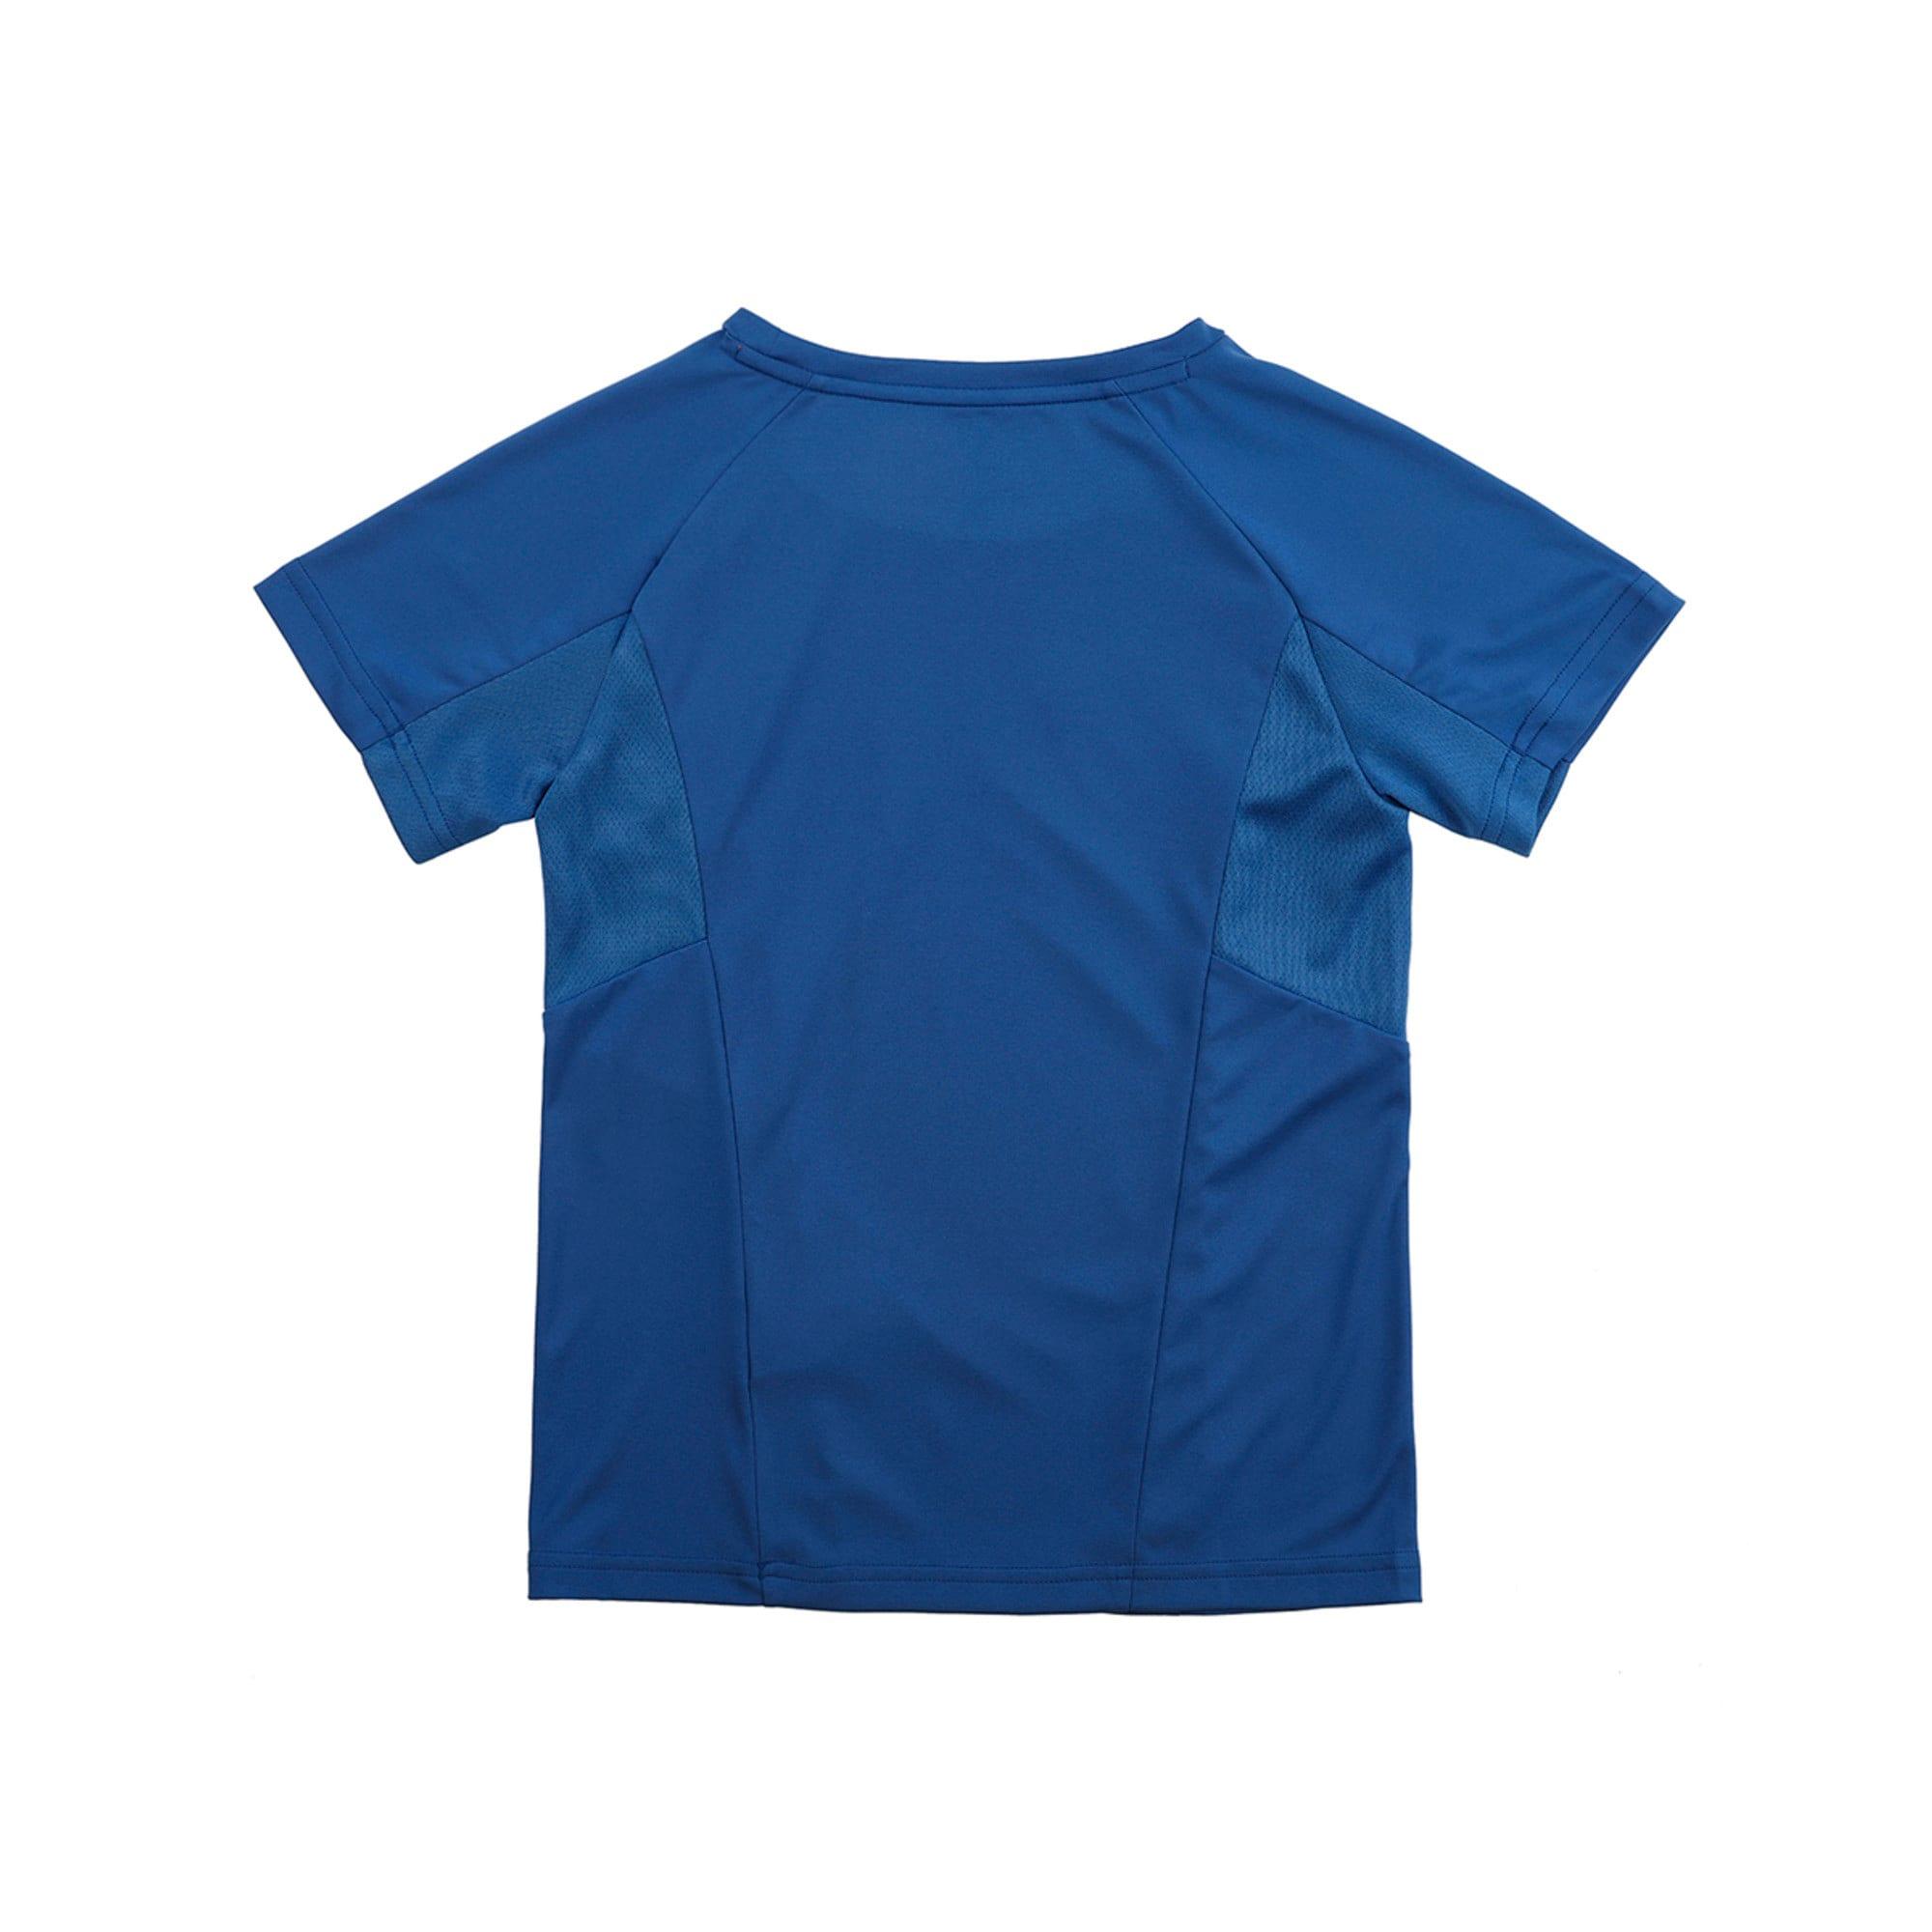 Thumbnail 2 of Active Sports Short Sleeve Boys' Tee, Galaxy Blue, medium-IND